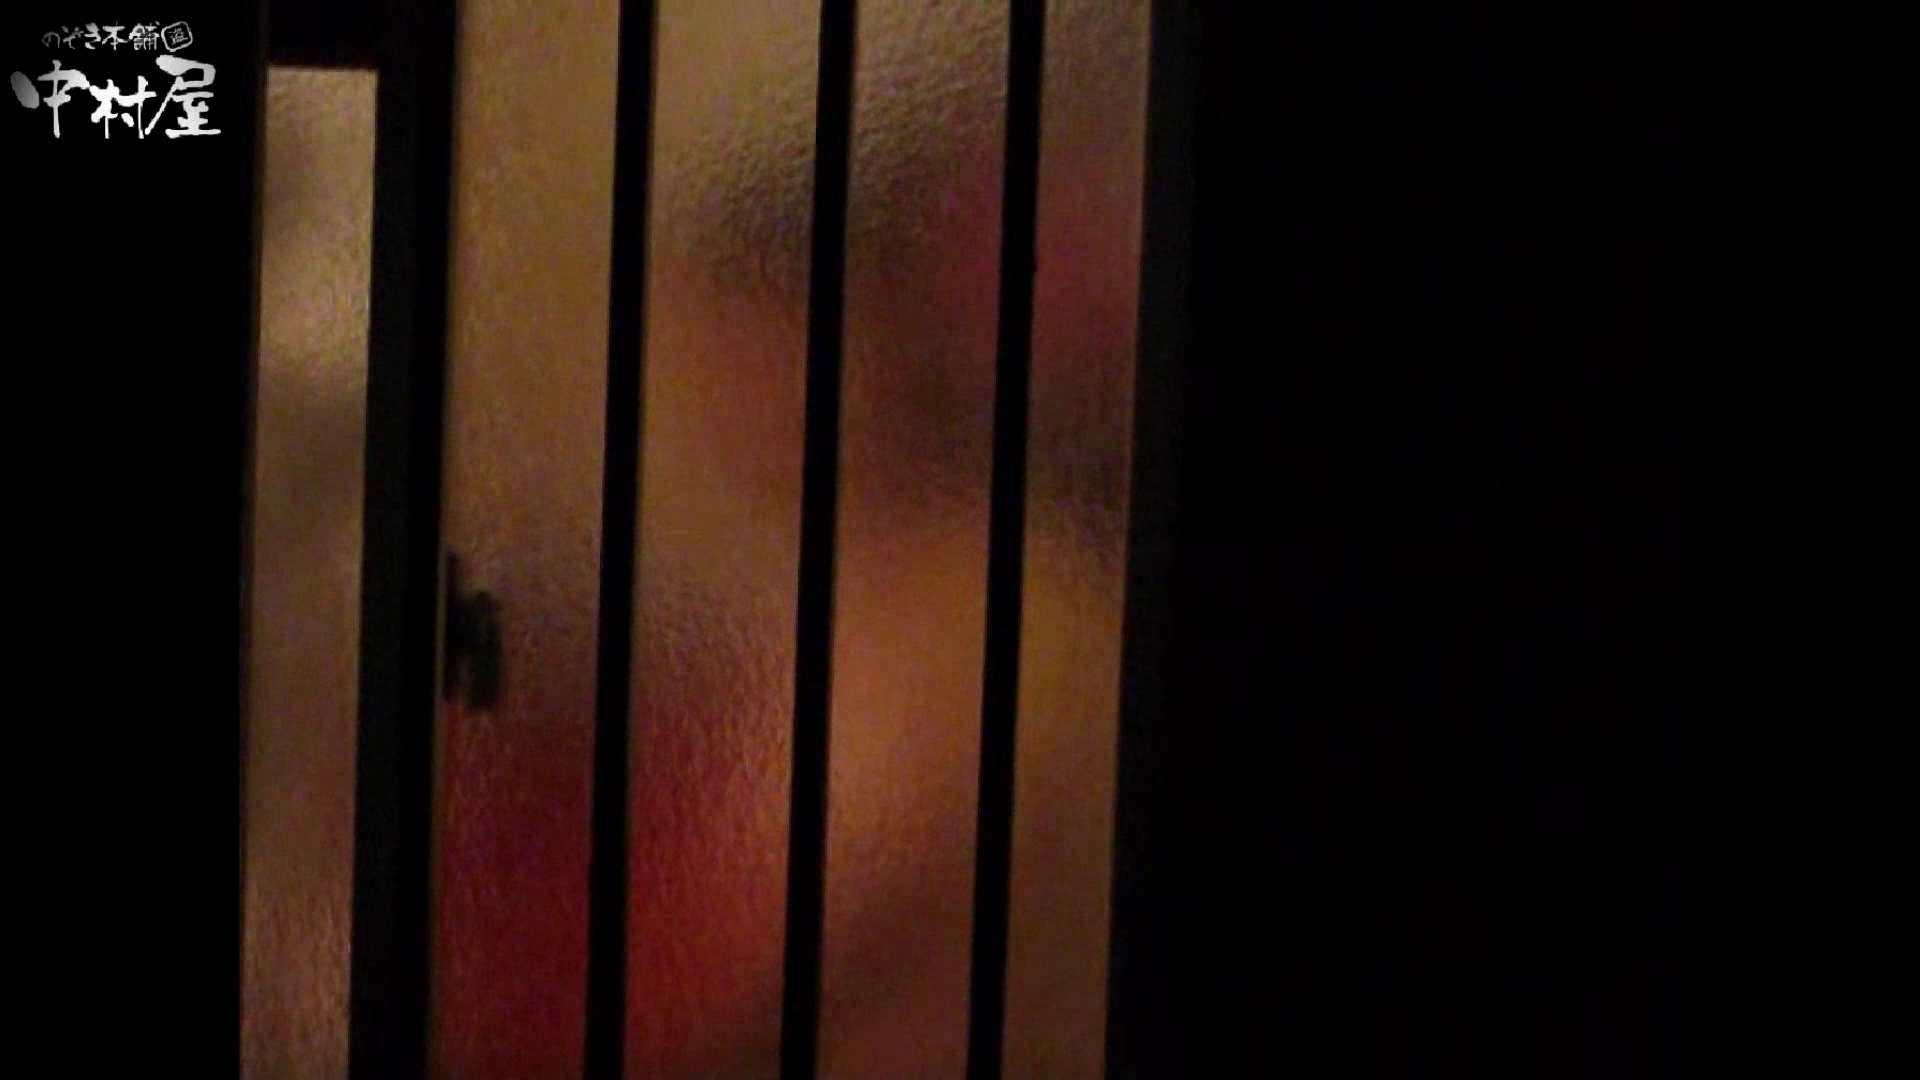 民家風呂専門盗撮師の超危険映像 vol.003 美少女ヌード   盗撮  58pic 51